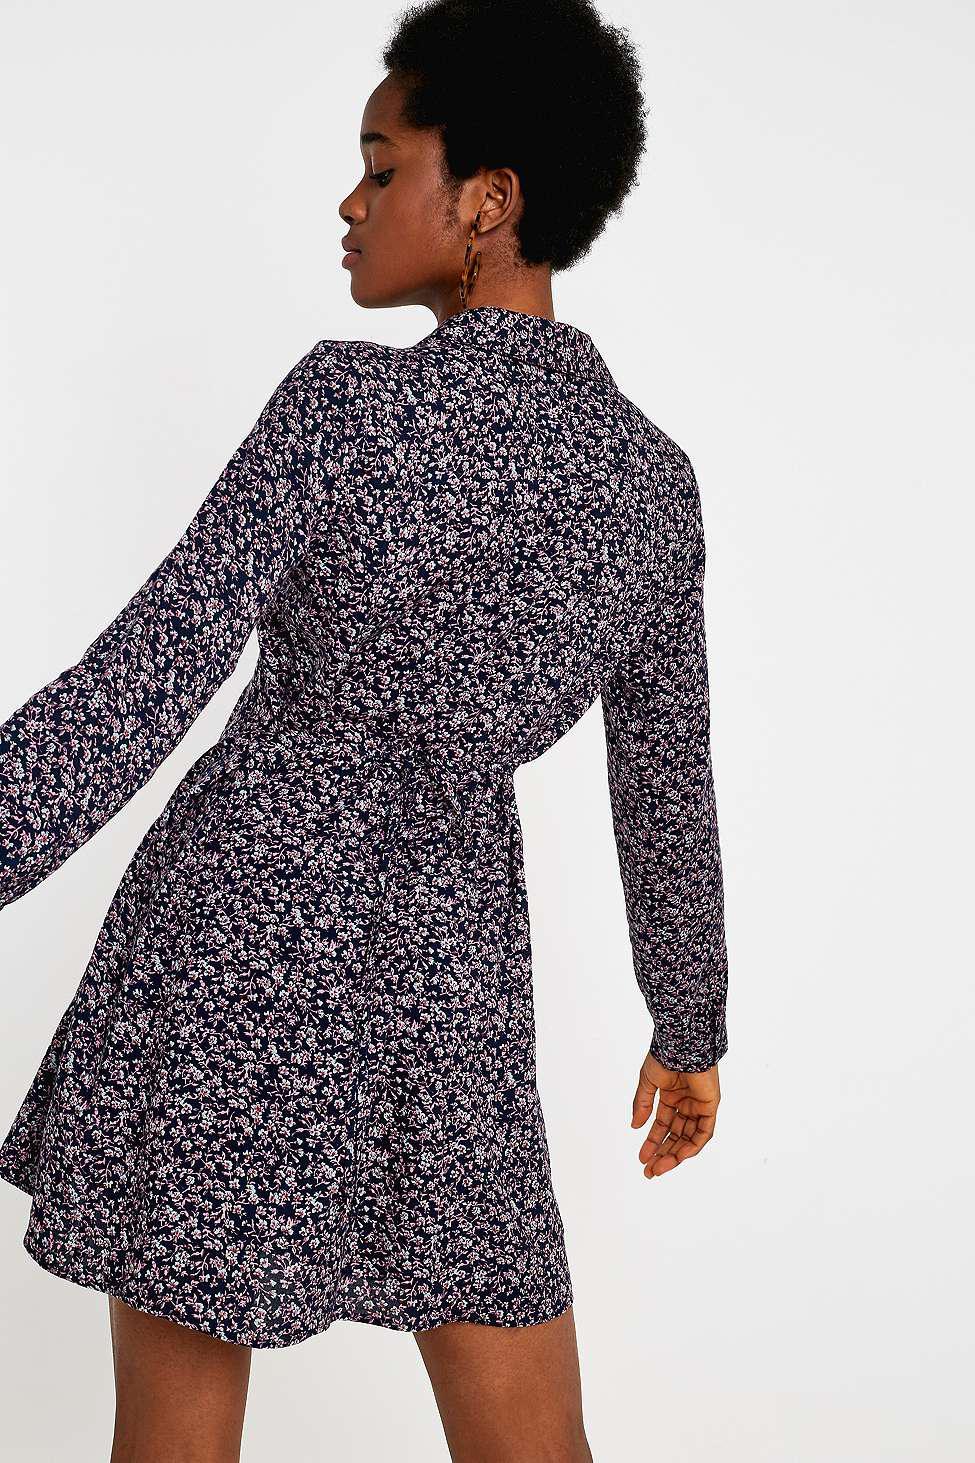 Urban Renewal Remnants Ditsy Pink Tea Dress - Womens S in Blue - Lyst 5c2f7d66a